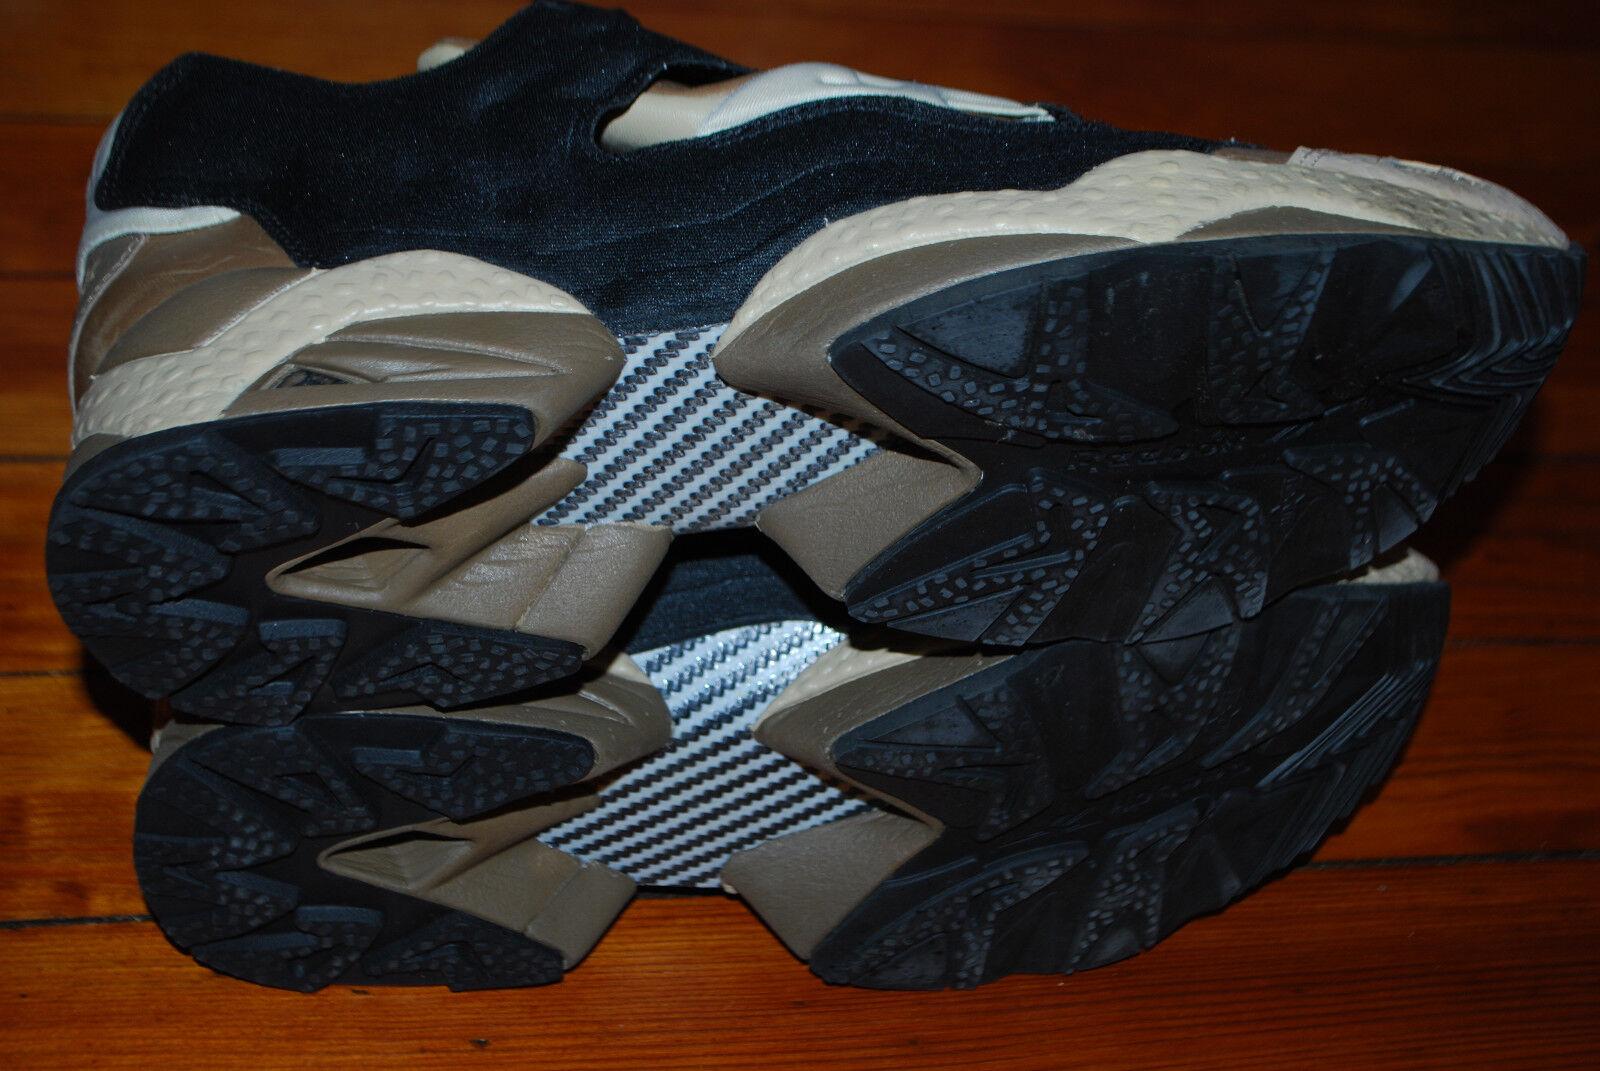 RARE Uomo Reebok Insta Pump Fury Fury Fury Plus Cashew   Dark Marronee scarpe da ginnastica (13) 74aef0